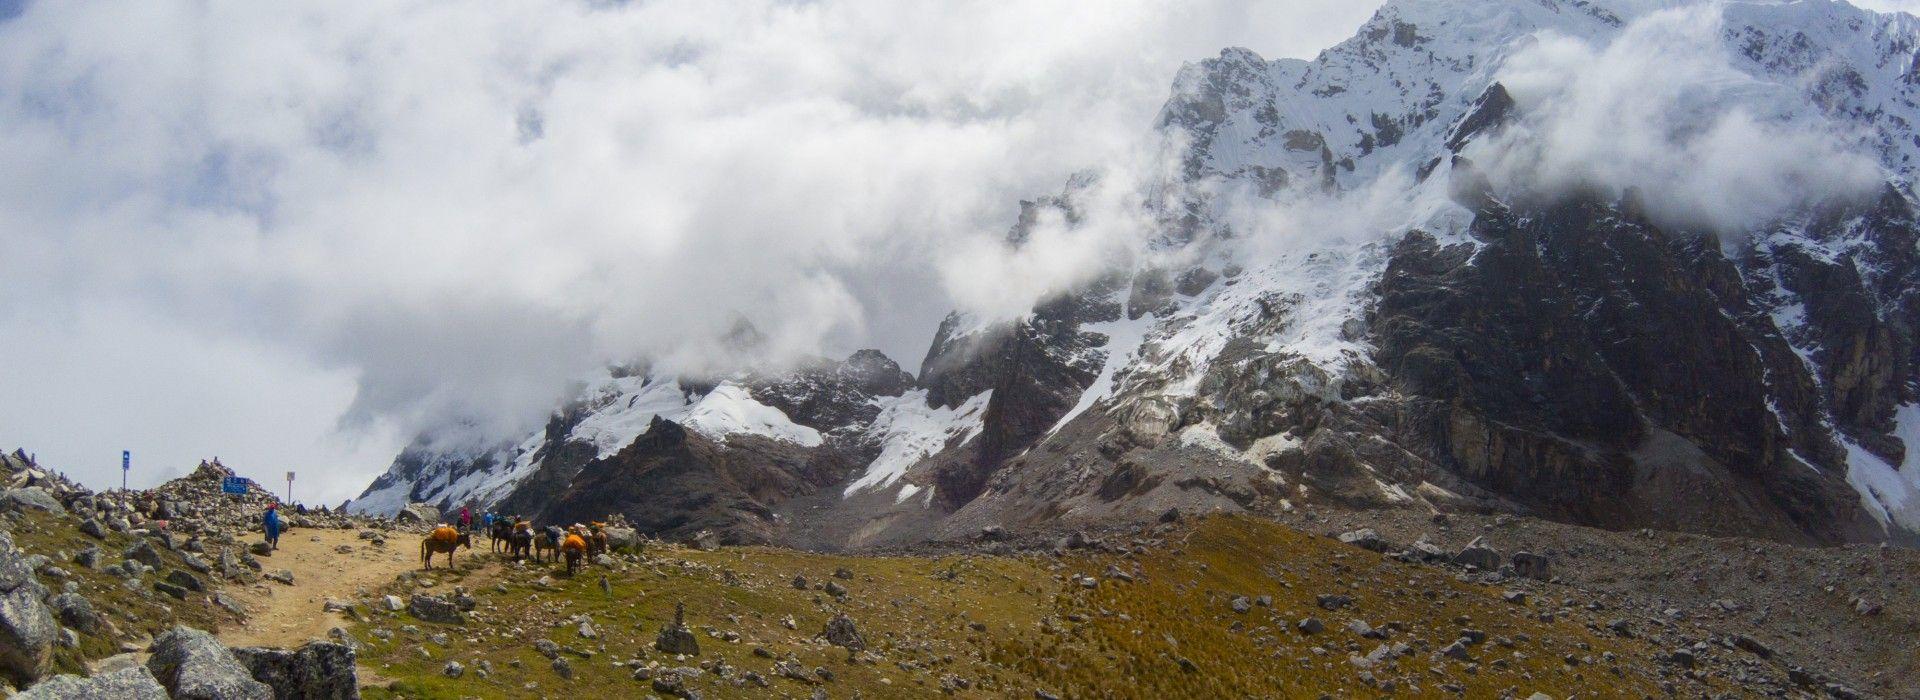 Family Tours in Peru